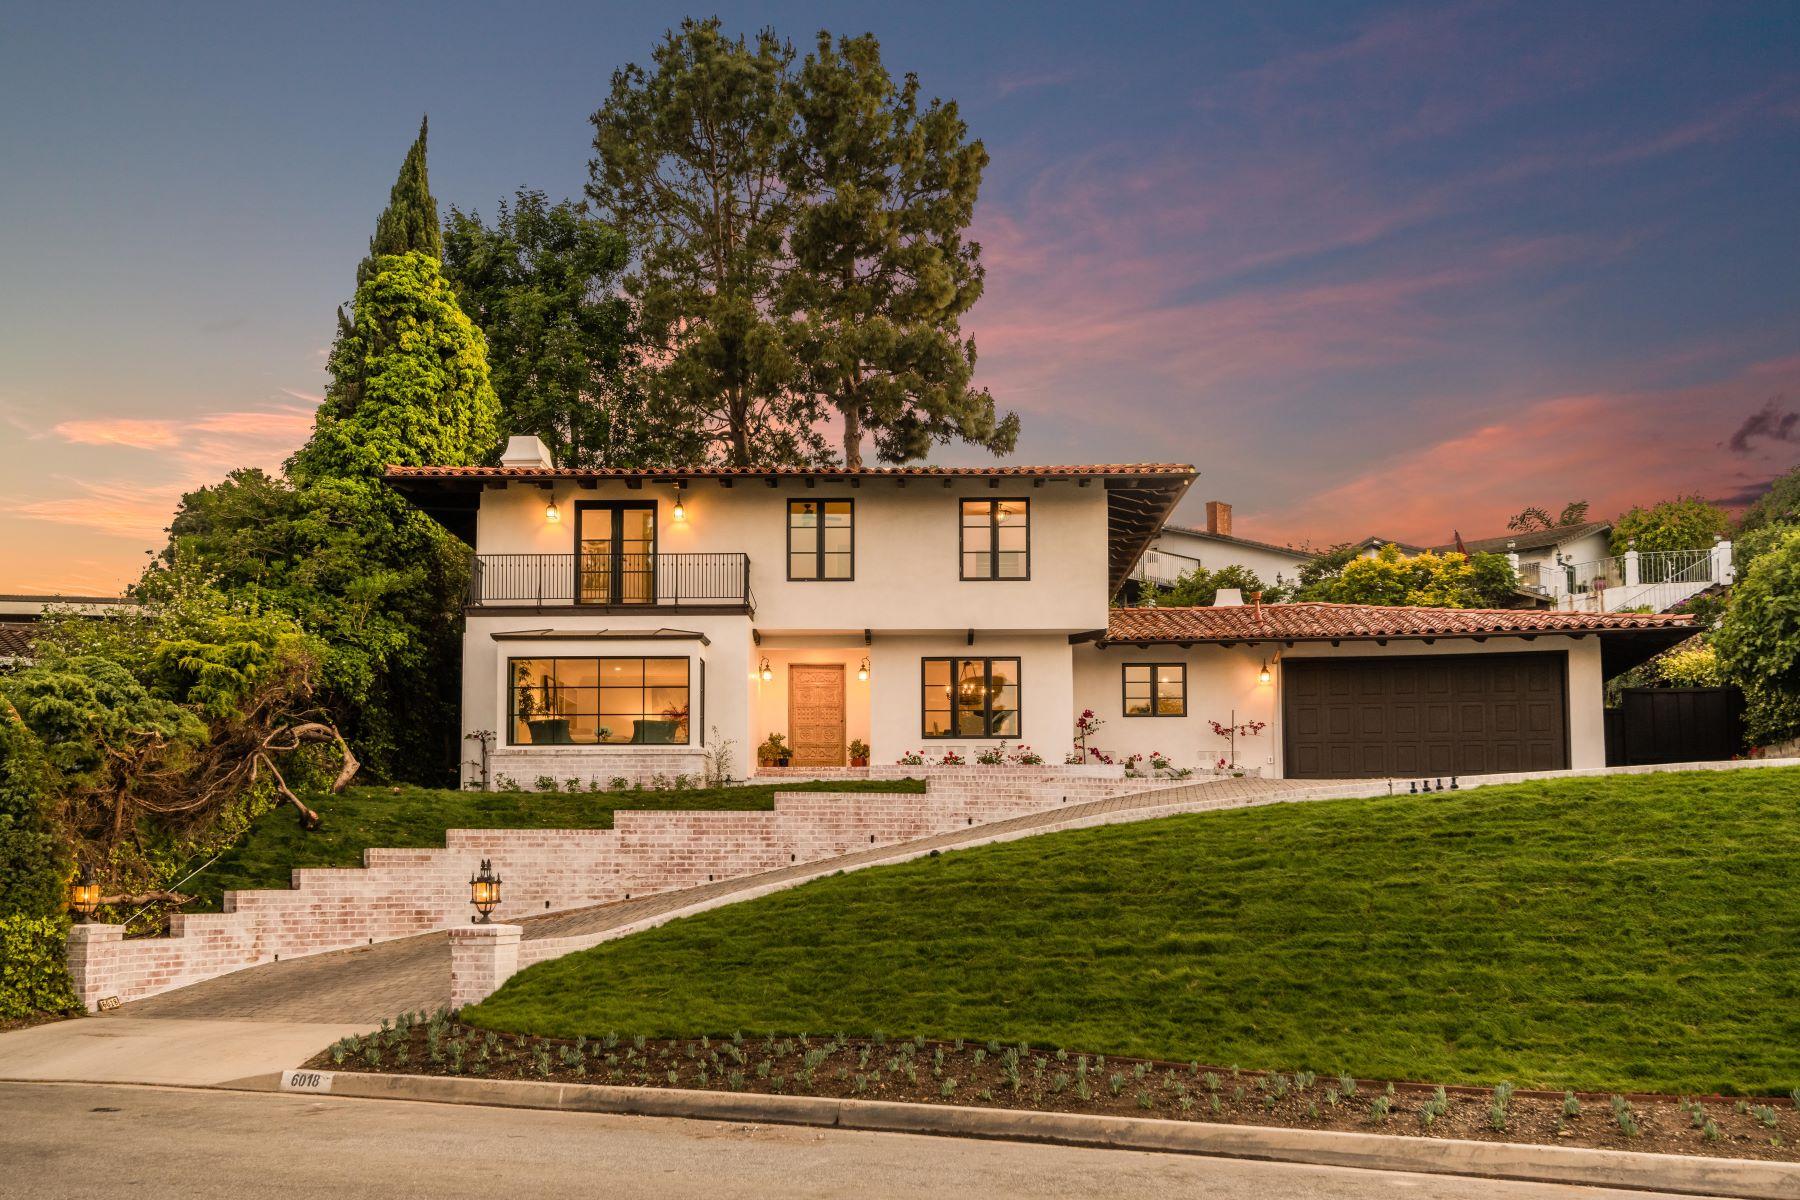 Single Family Homes for Active at 6018 Vía Sonoma, Rancho Palos Verdes, CA 90275 6018 Vía Sonoma Rancho Palos Verdes, California 90275 United States